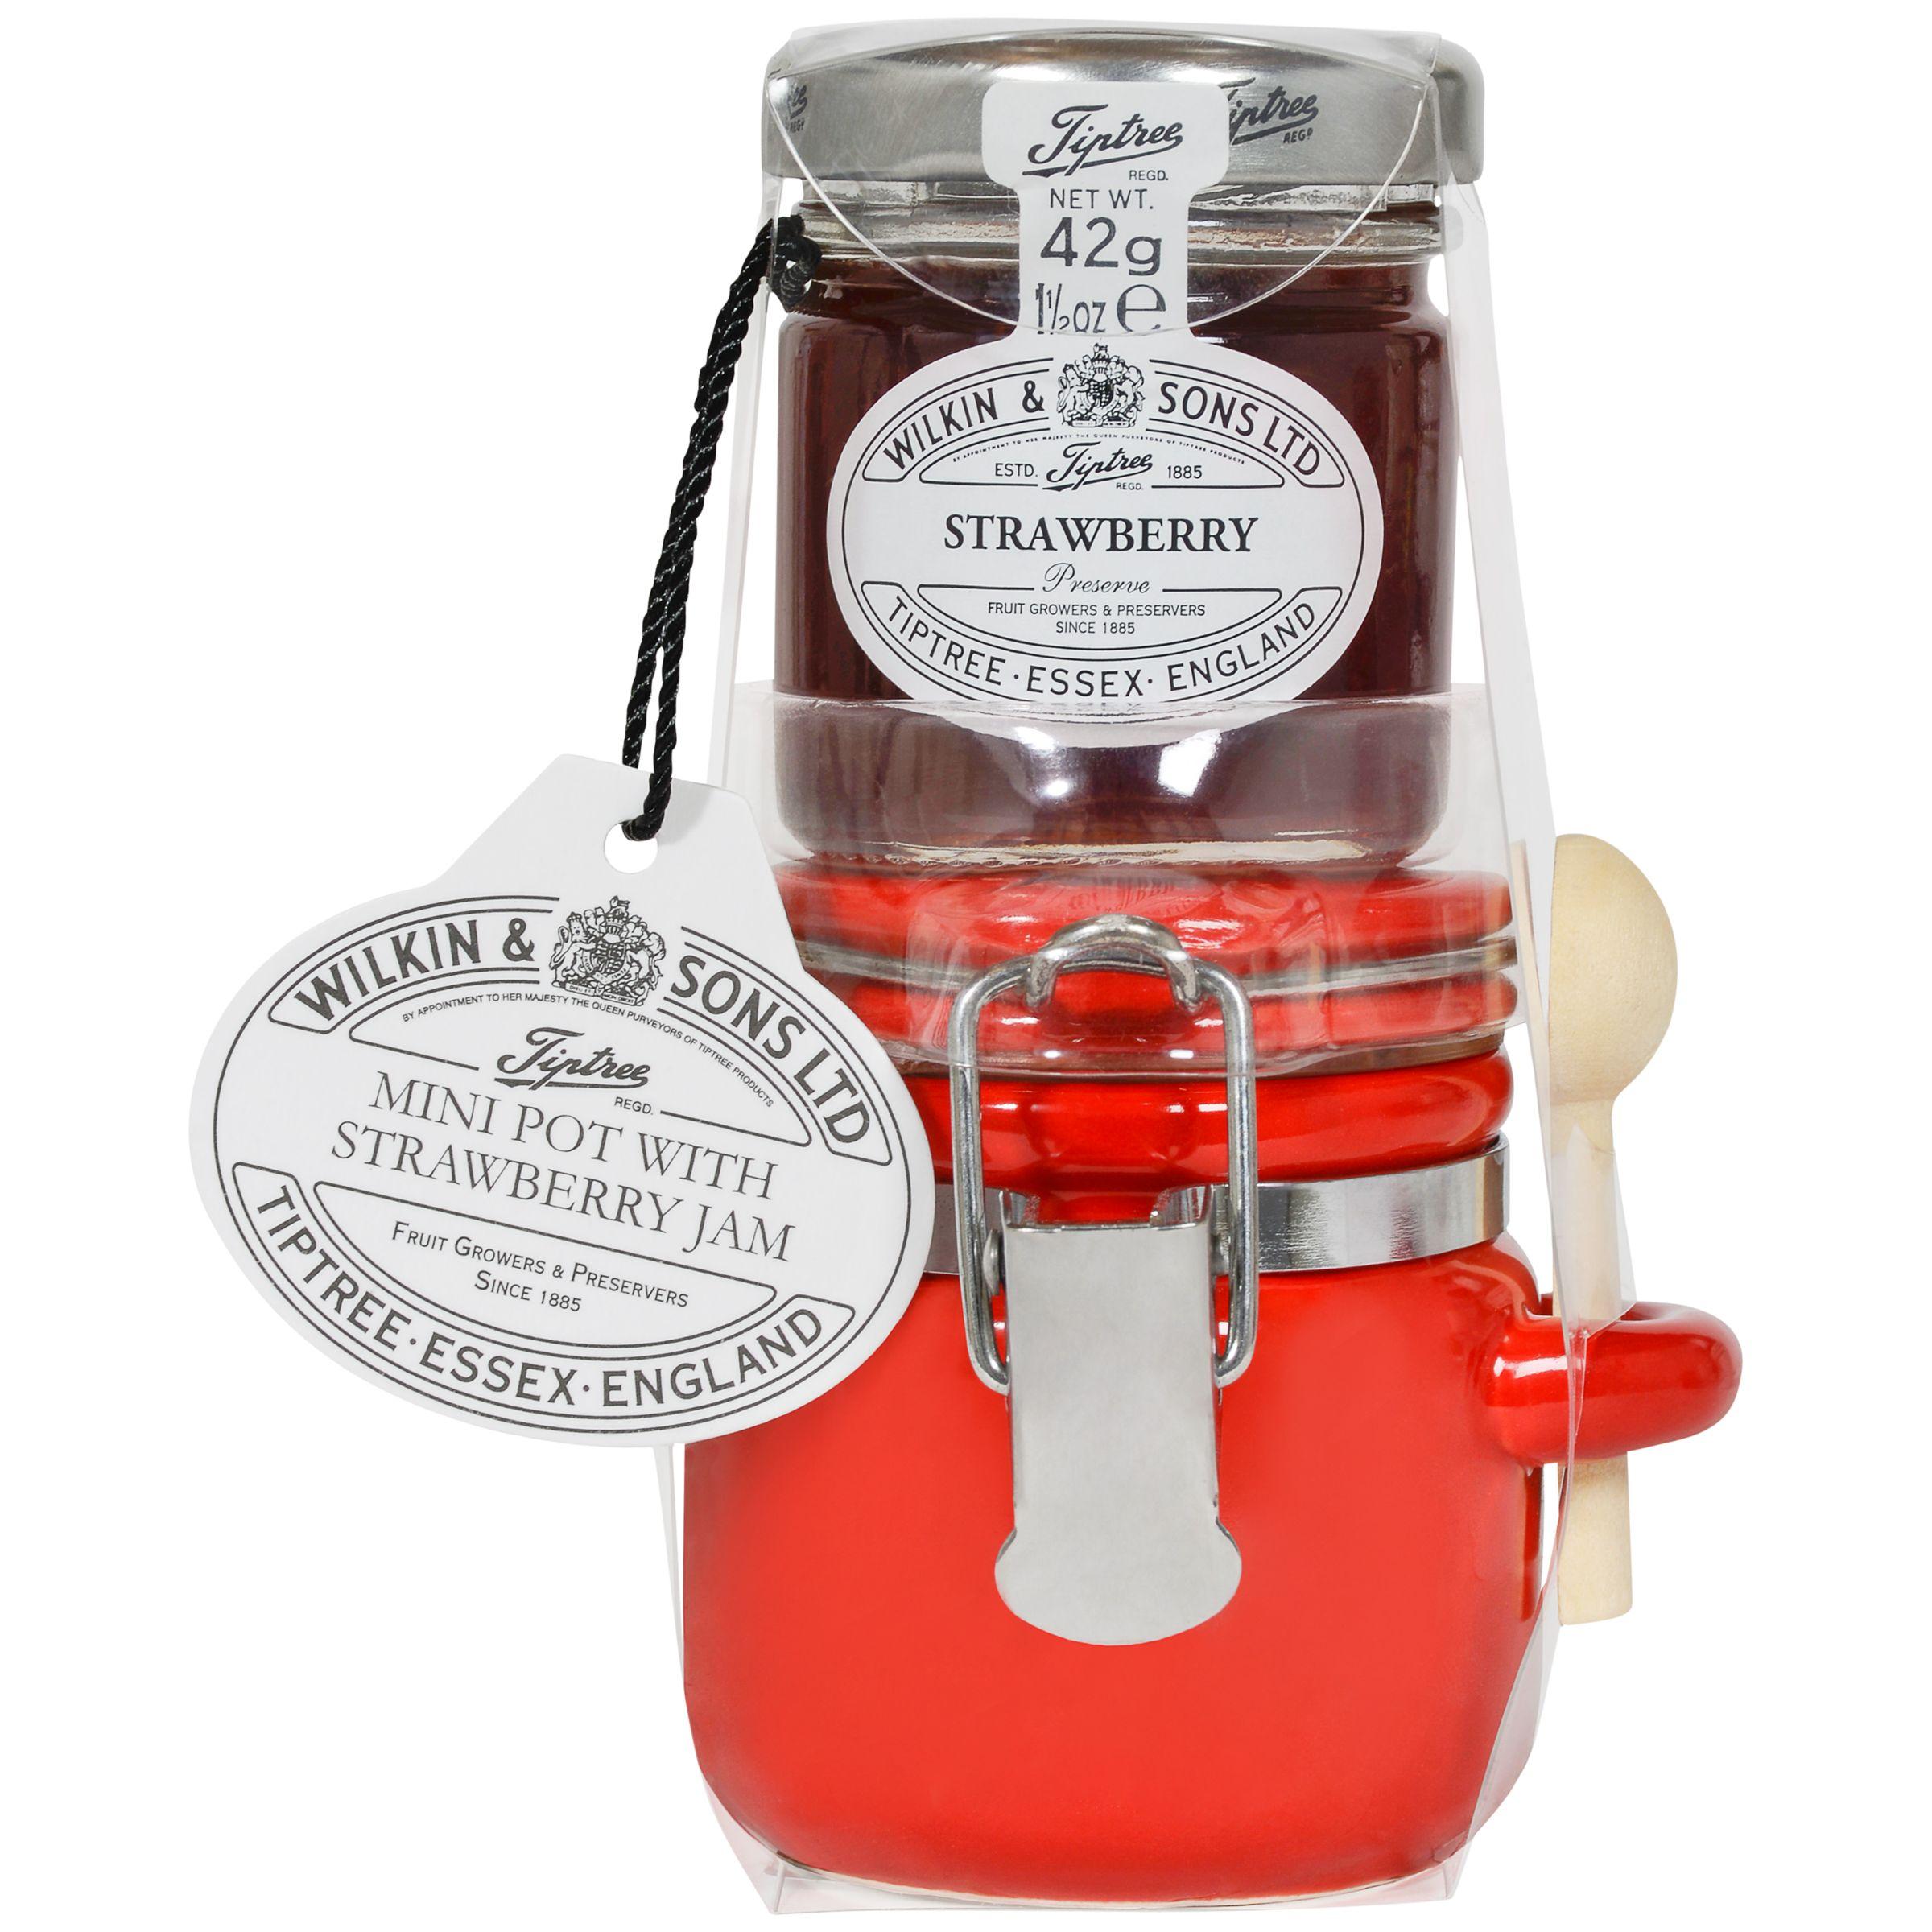 Wilkin & Sons Wilkin & Sons Tiptree Mini Pot with Strawberry Jam Set, 42g